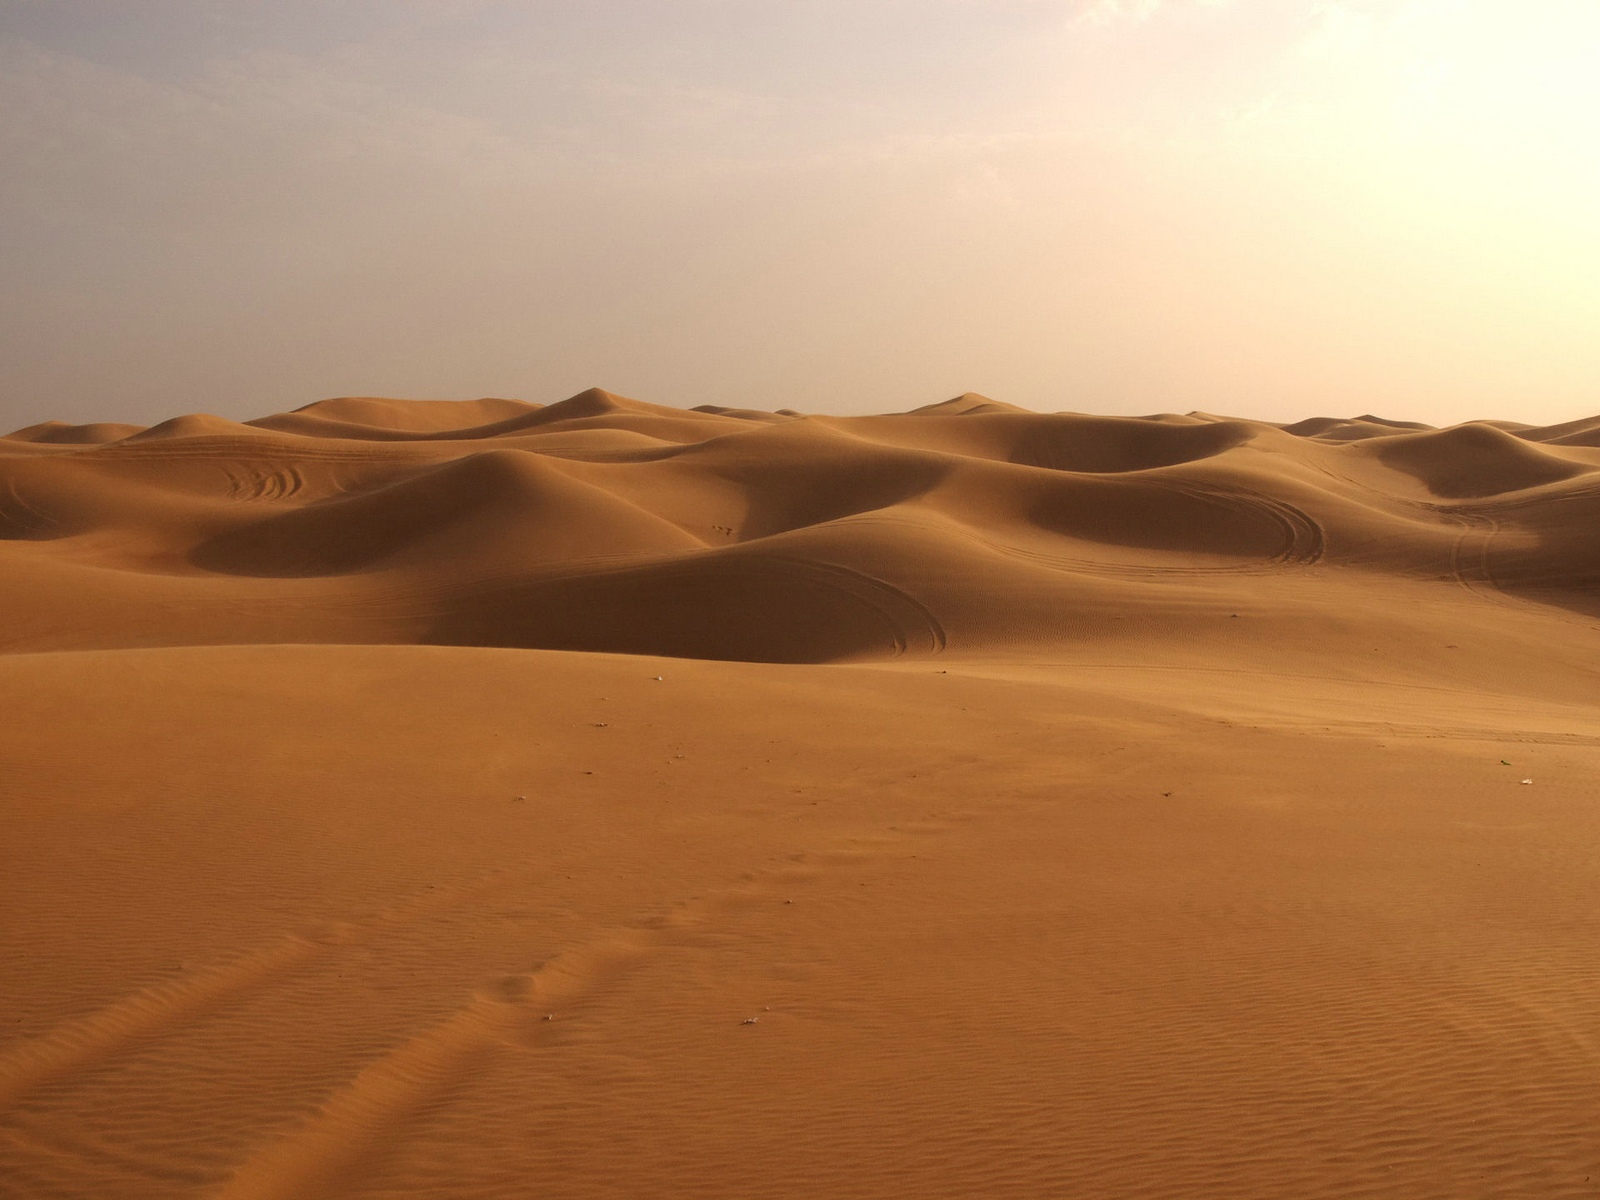 Sahara Landscape Wallpaper